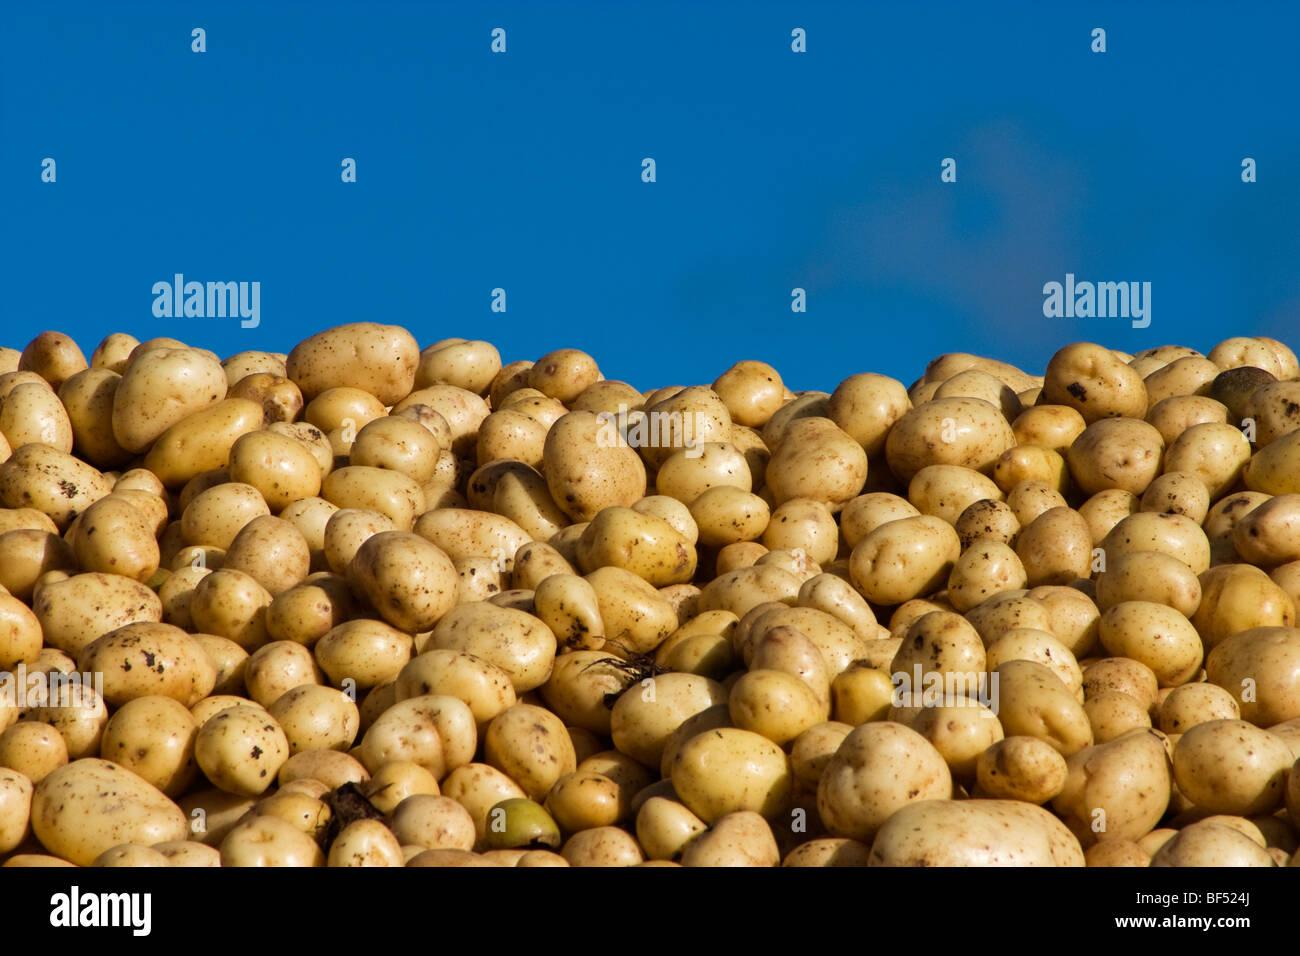 Agriculture - Freshly harvested Russet potatoes / Klamath Basin, Oregon, USA. - Stock Image